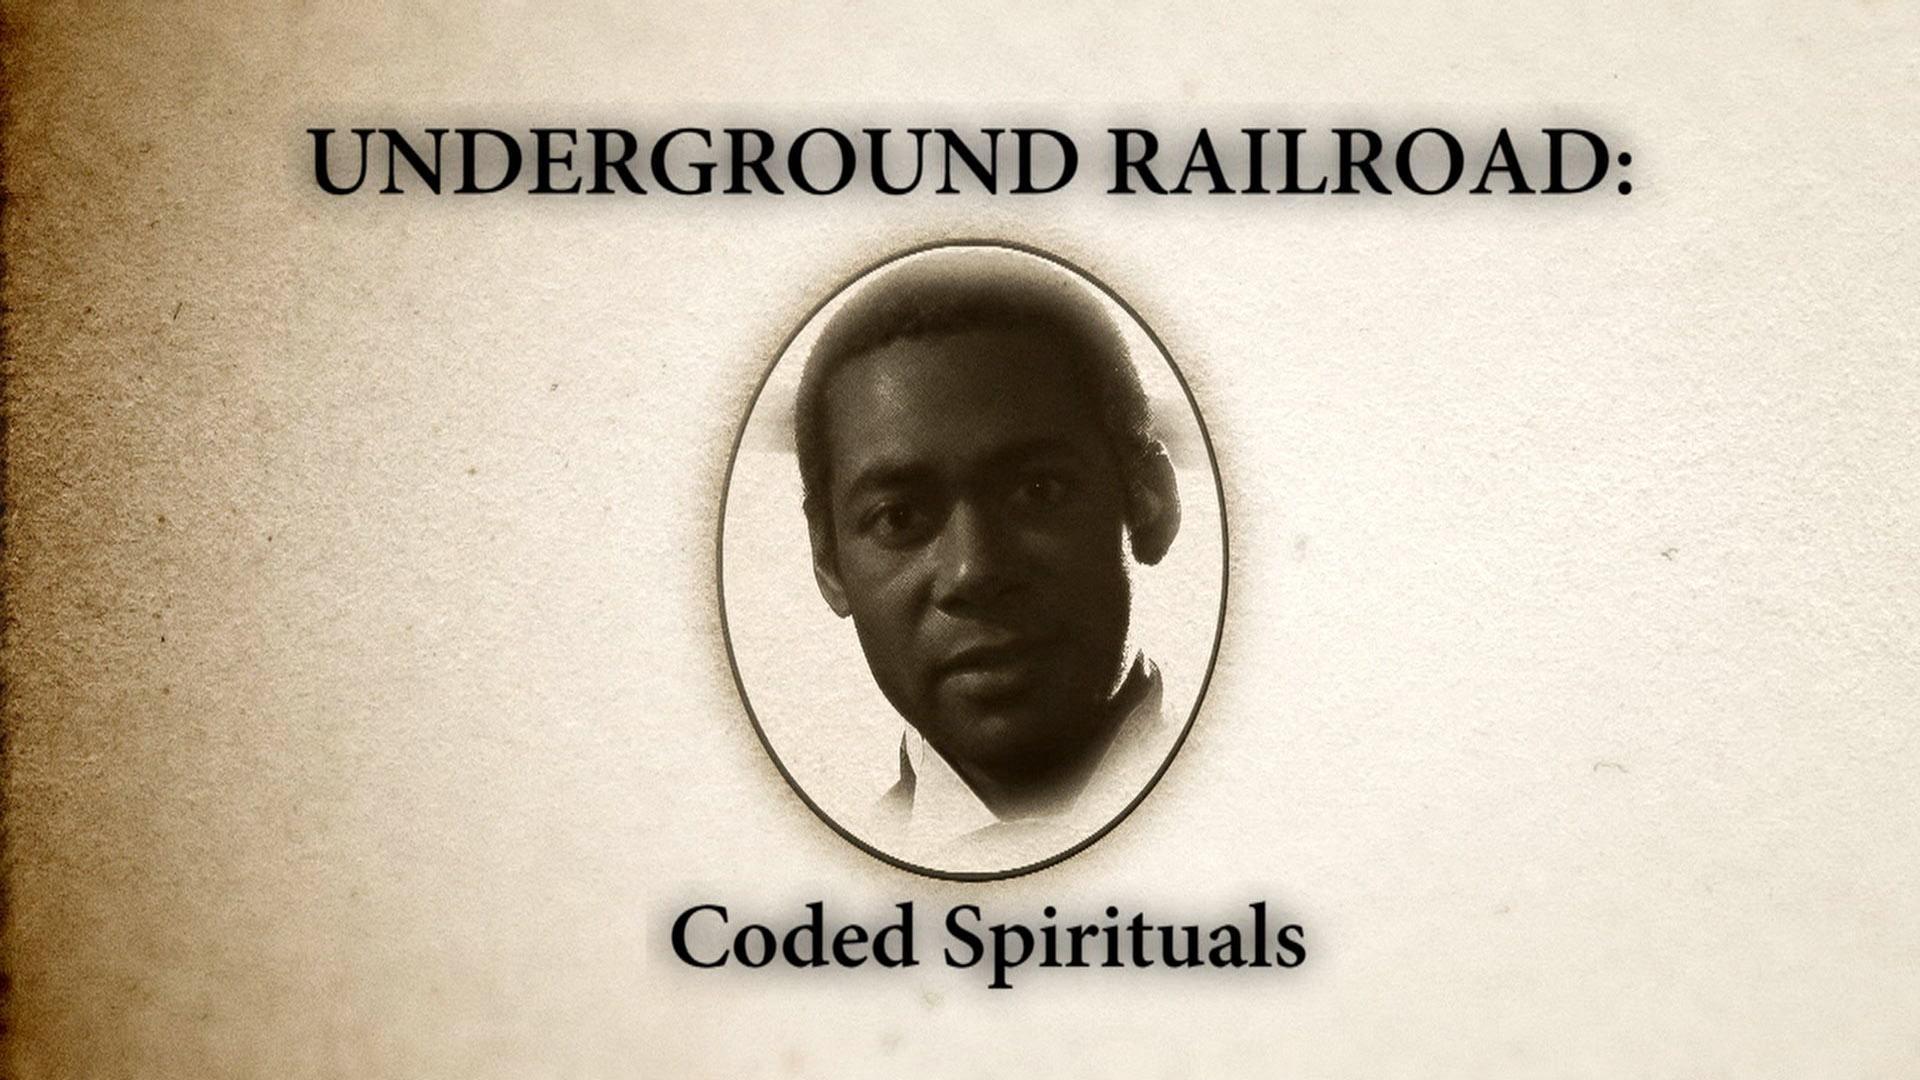 Coded Spirituals